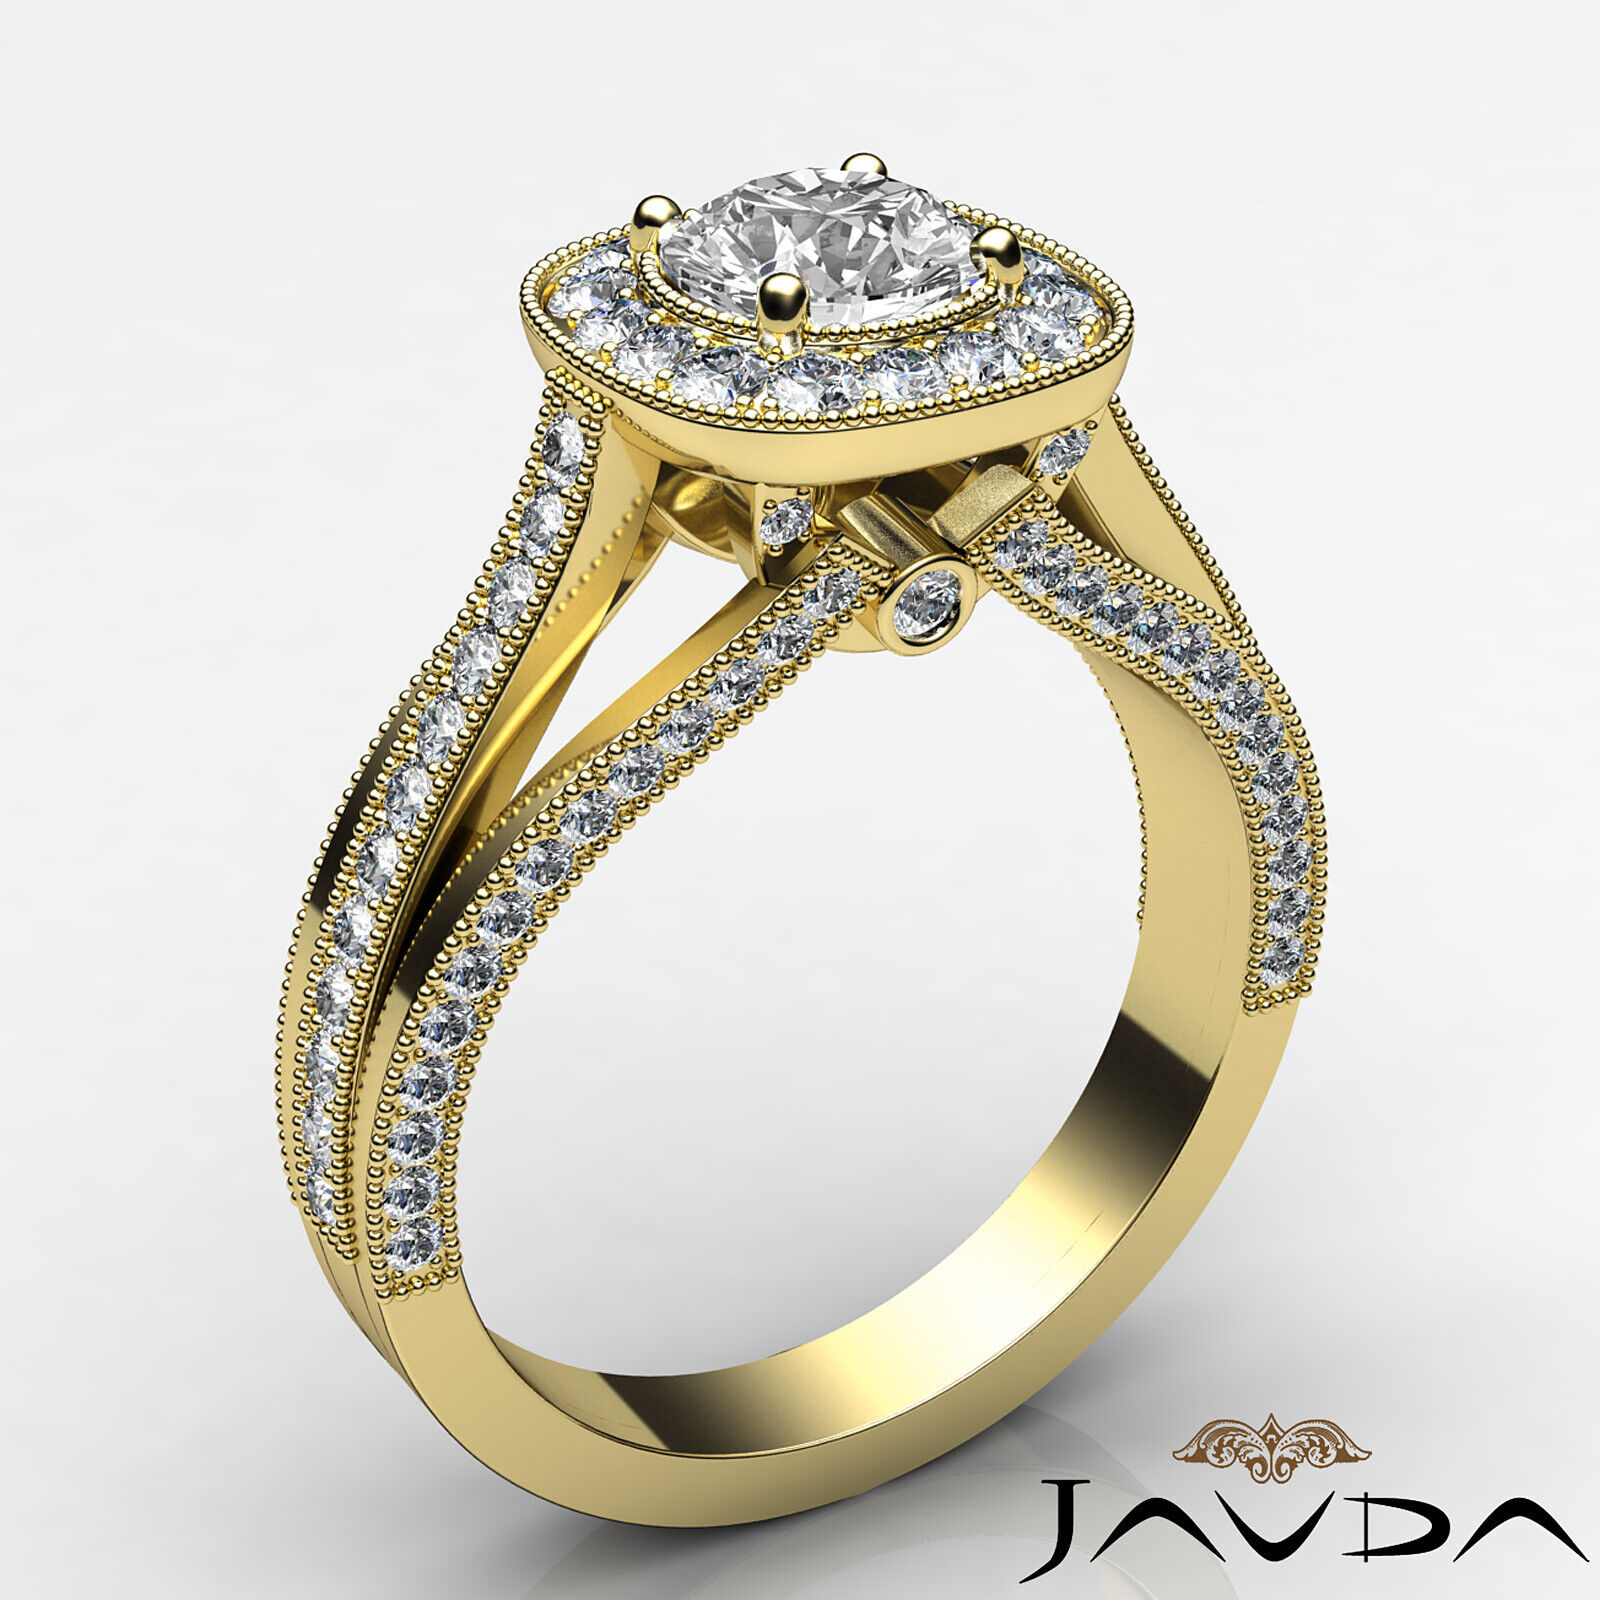 1.6ctw Bridge Accent Round Diamond Engagement Ring GIA E-VVS2 White Gold Rings 7